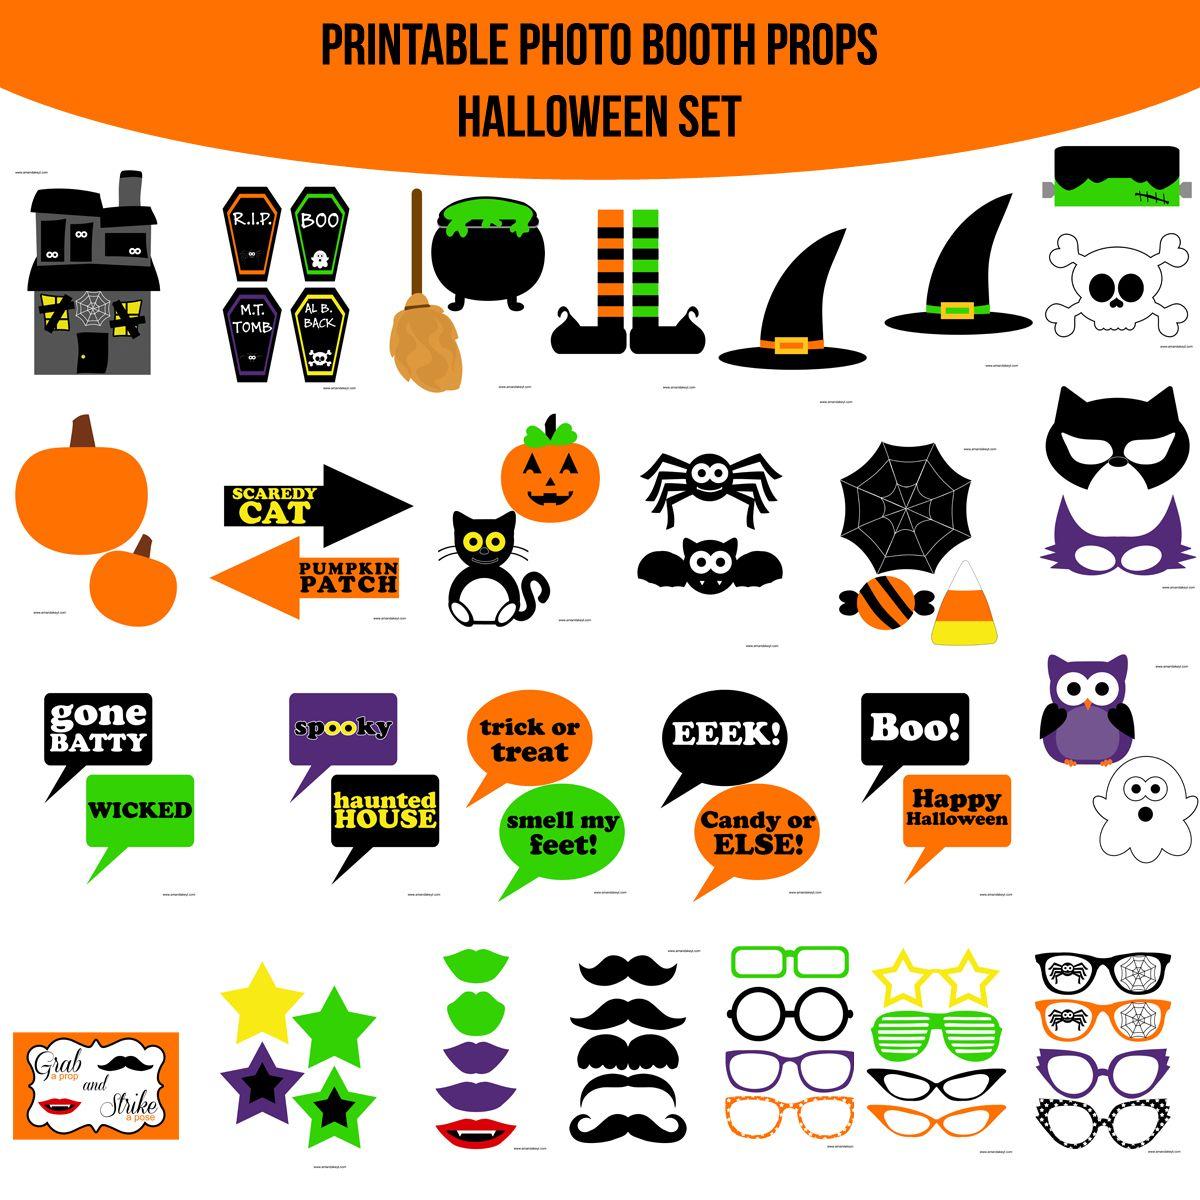 Instant Download Halloween Printable Photo Booth Prop Set